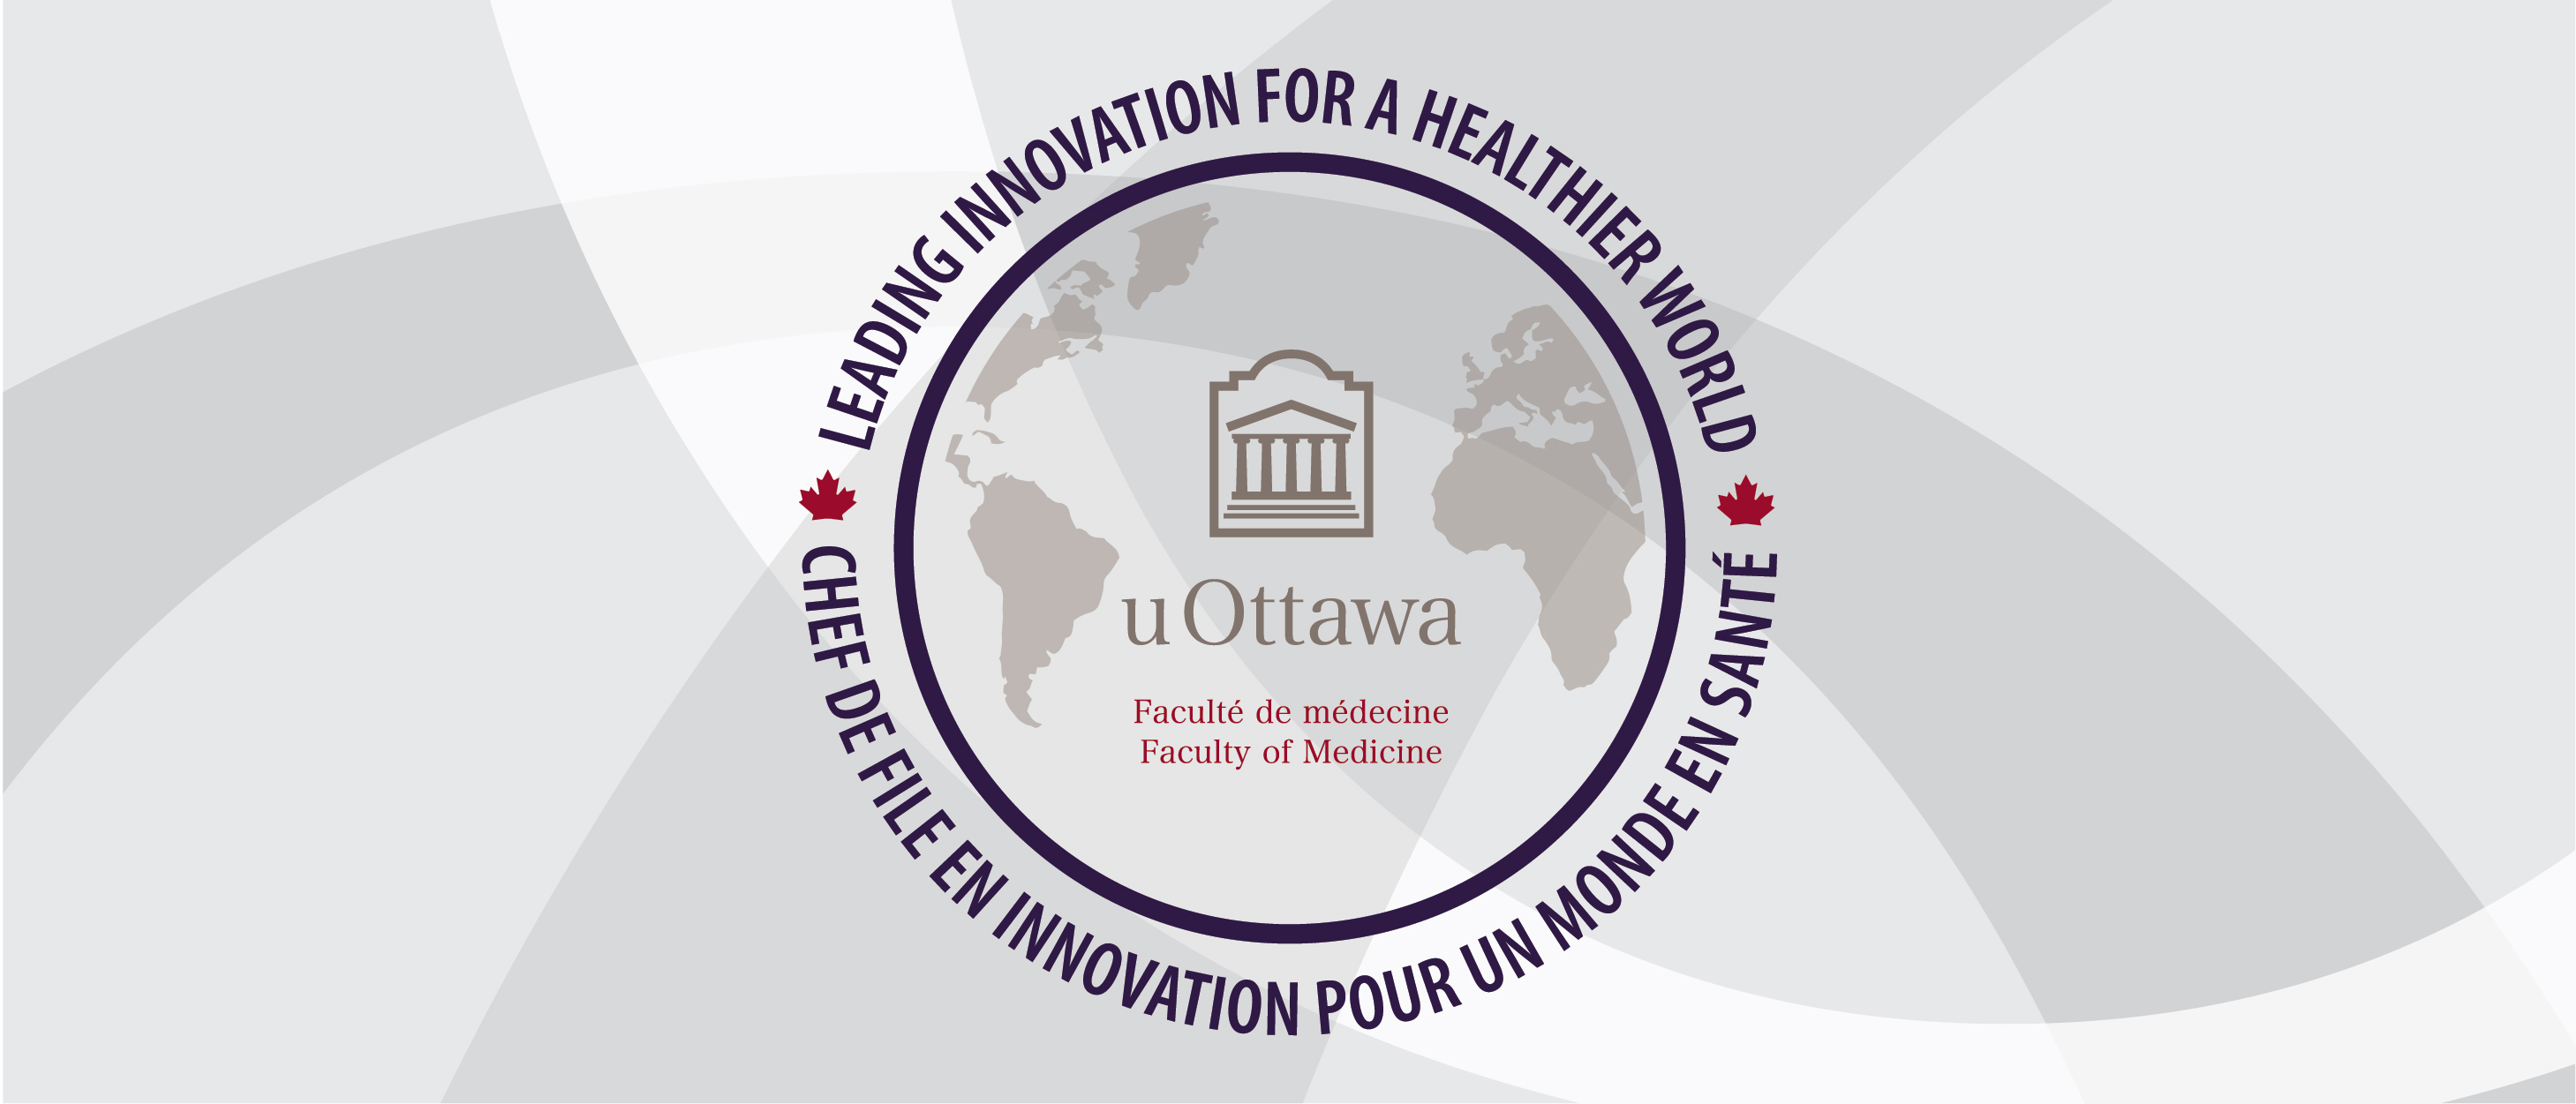 uOttawa Faculty of Medicine logo banner